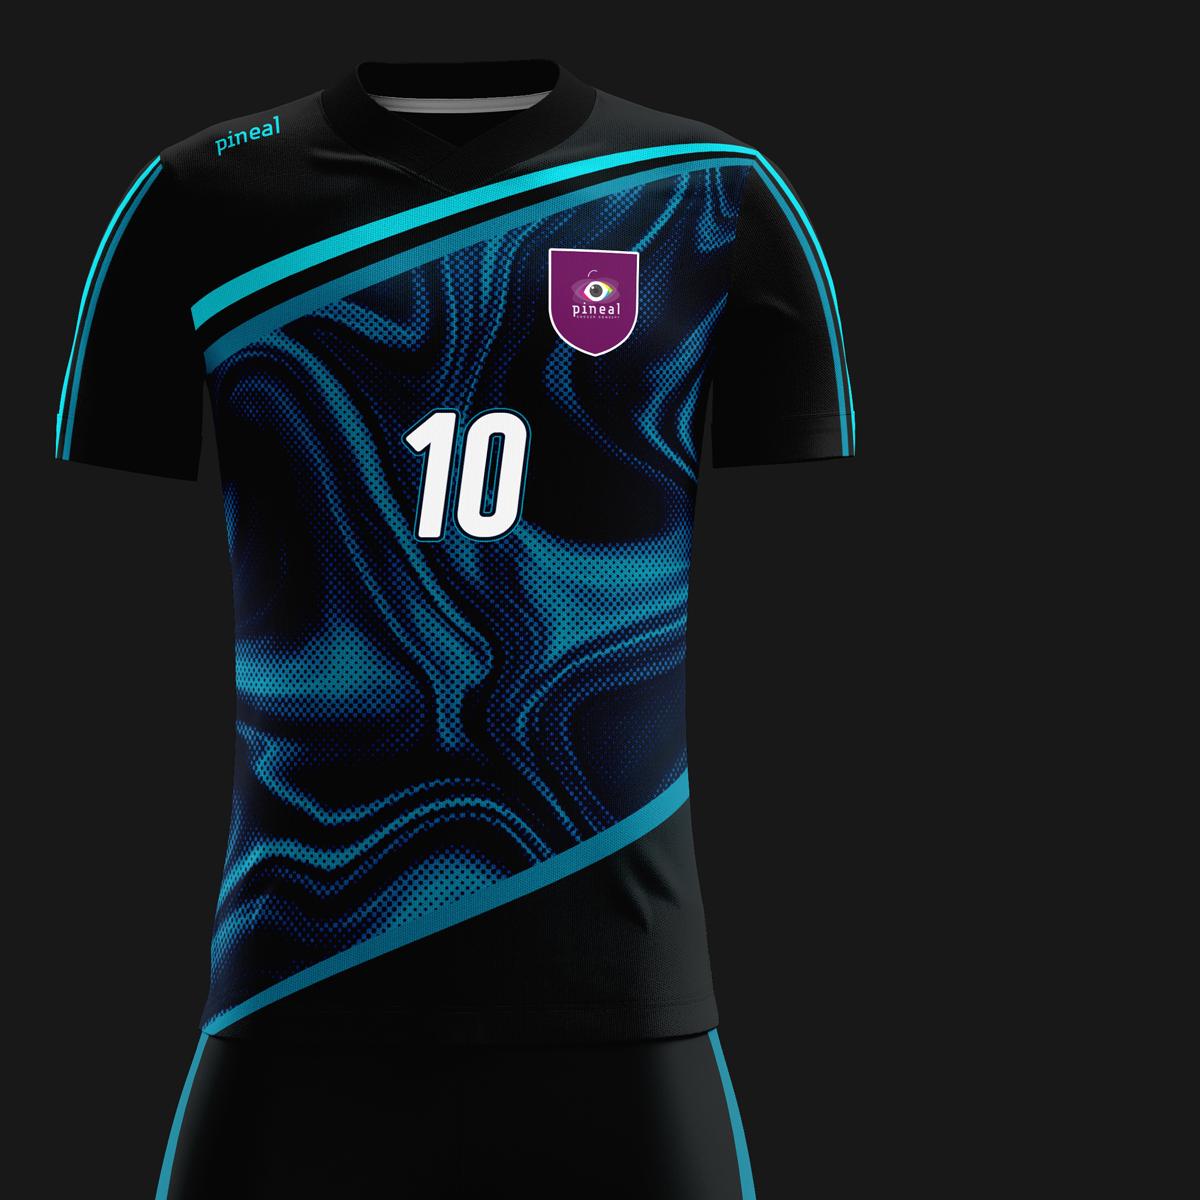 Vortex-Pineal-soccer